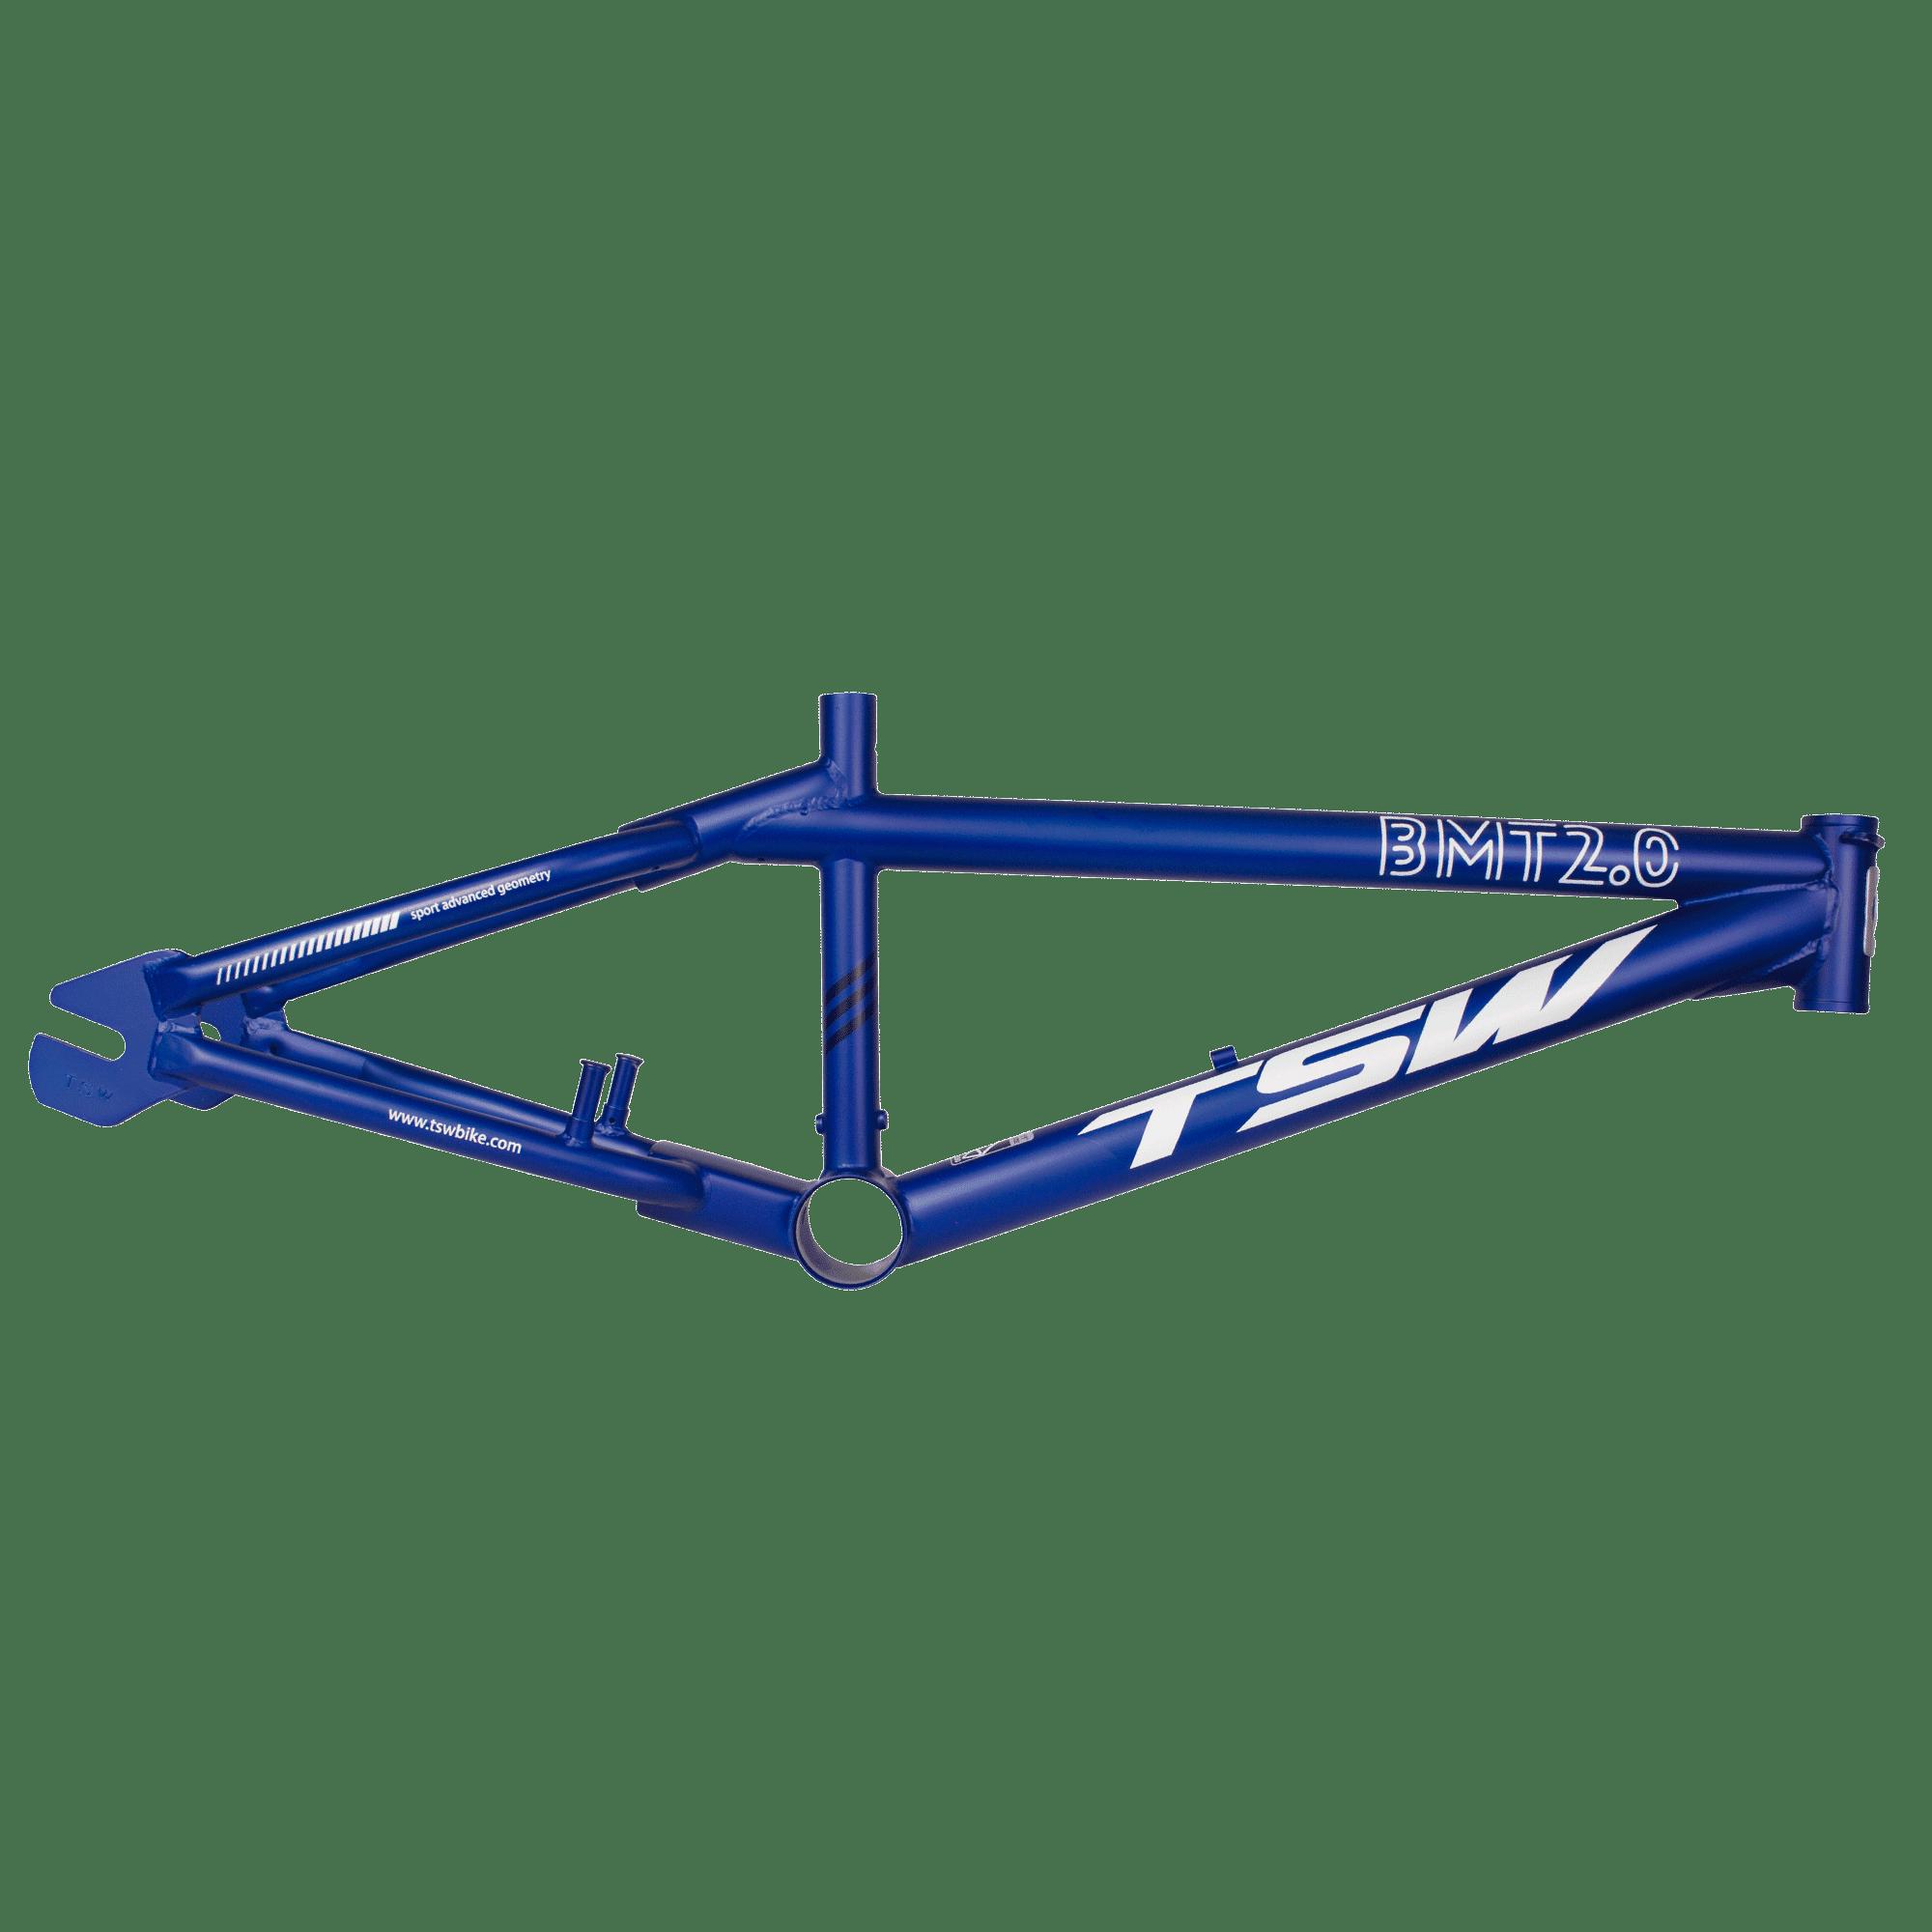 BMT 2.0 BMX Freestyle 4